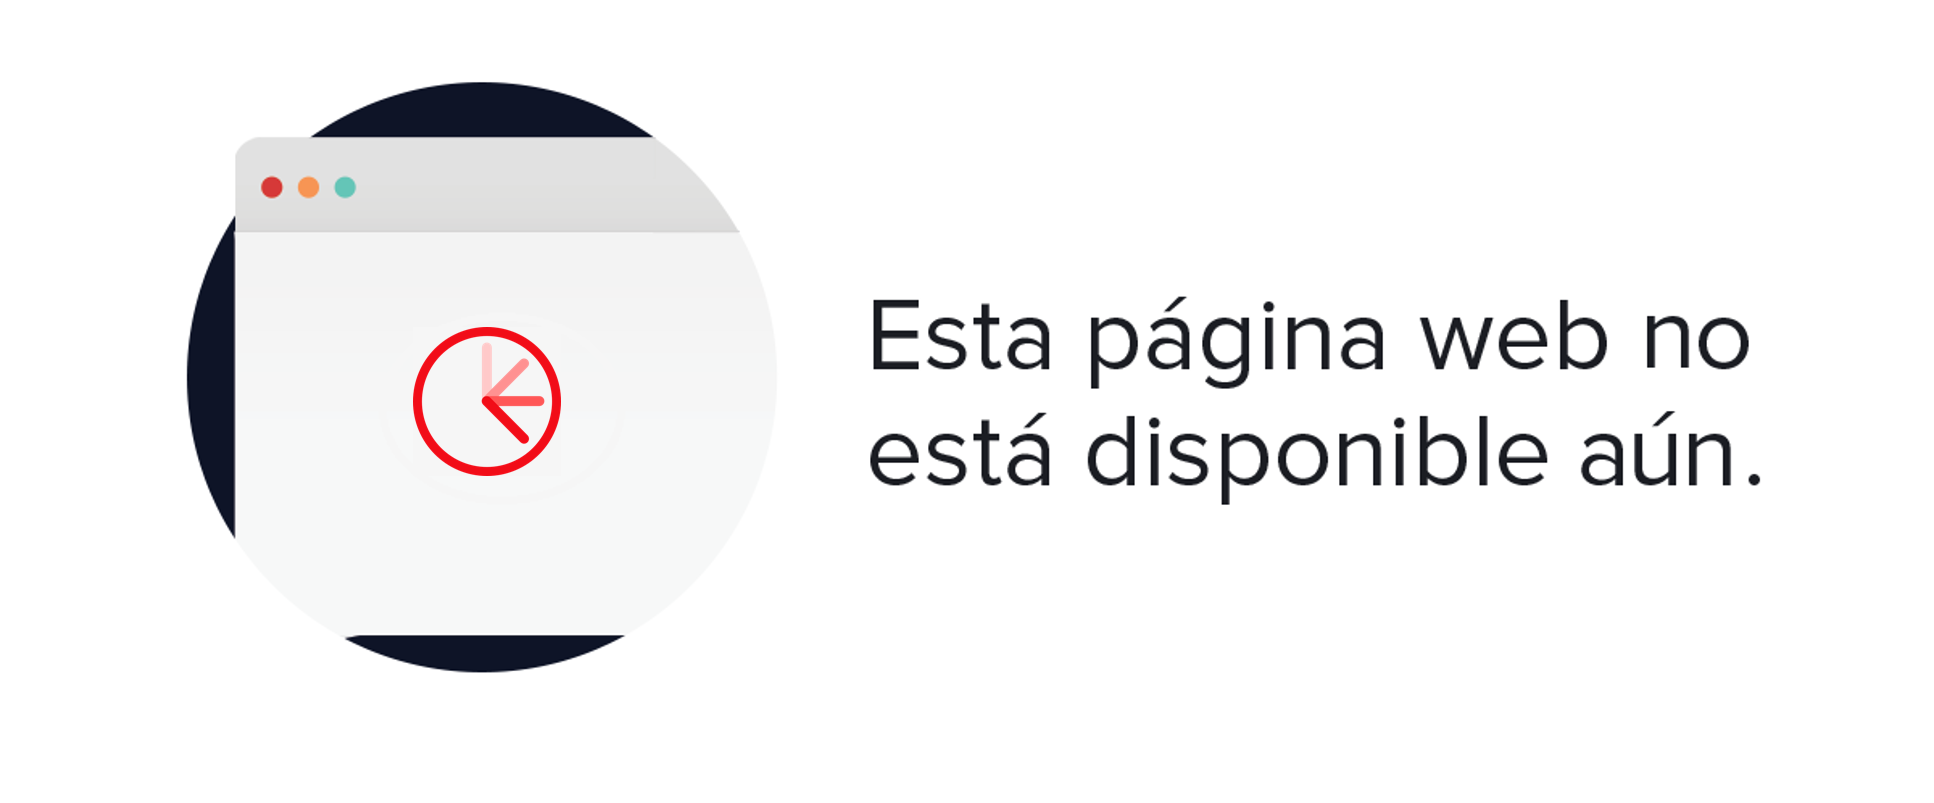 OXXO - Pantalón de mujer OXXO ancho y lazado Negro 8681613249585 - ZYCVHRW